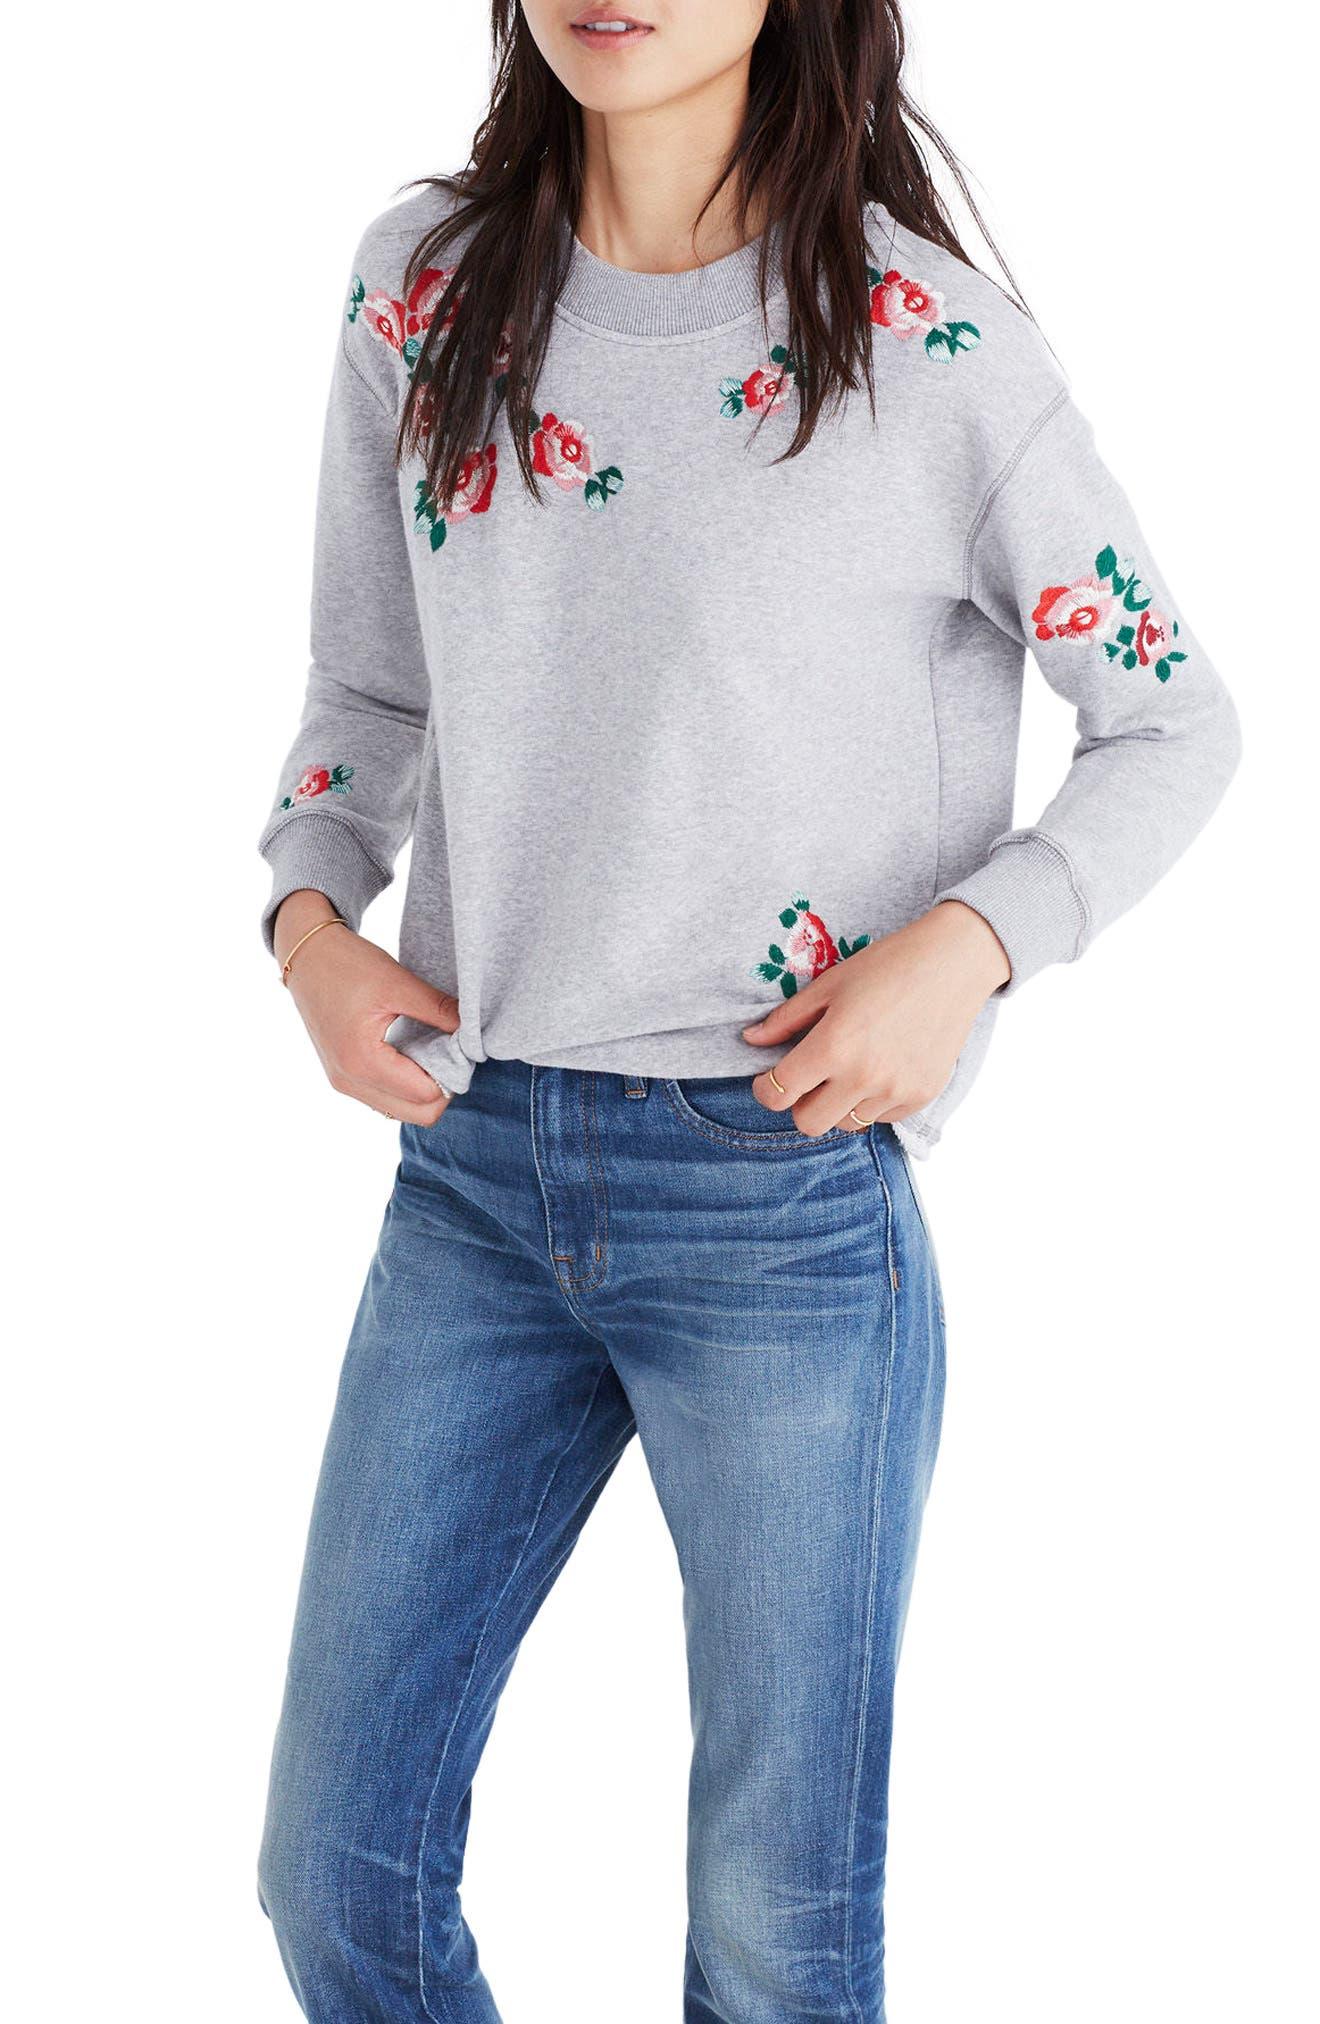 Madewell Embroidered Crop Sweatshirt